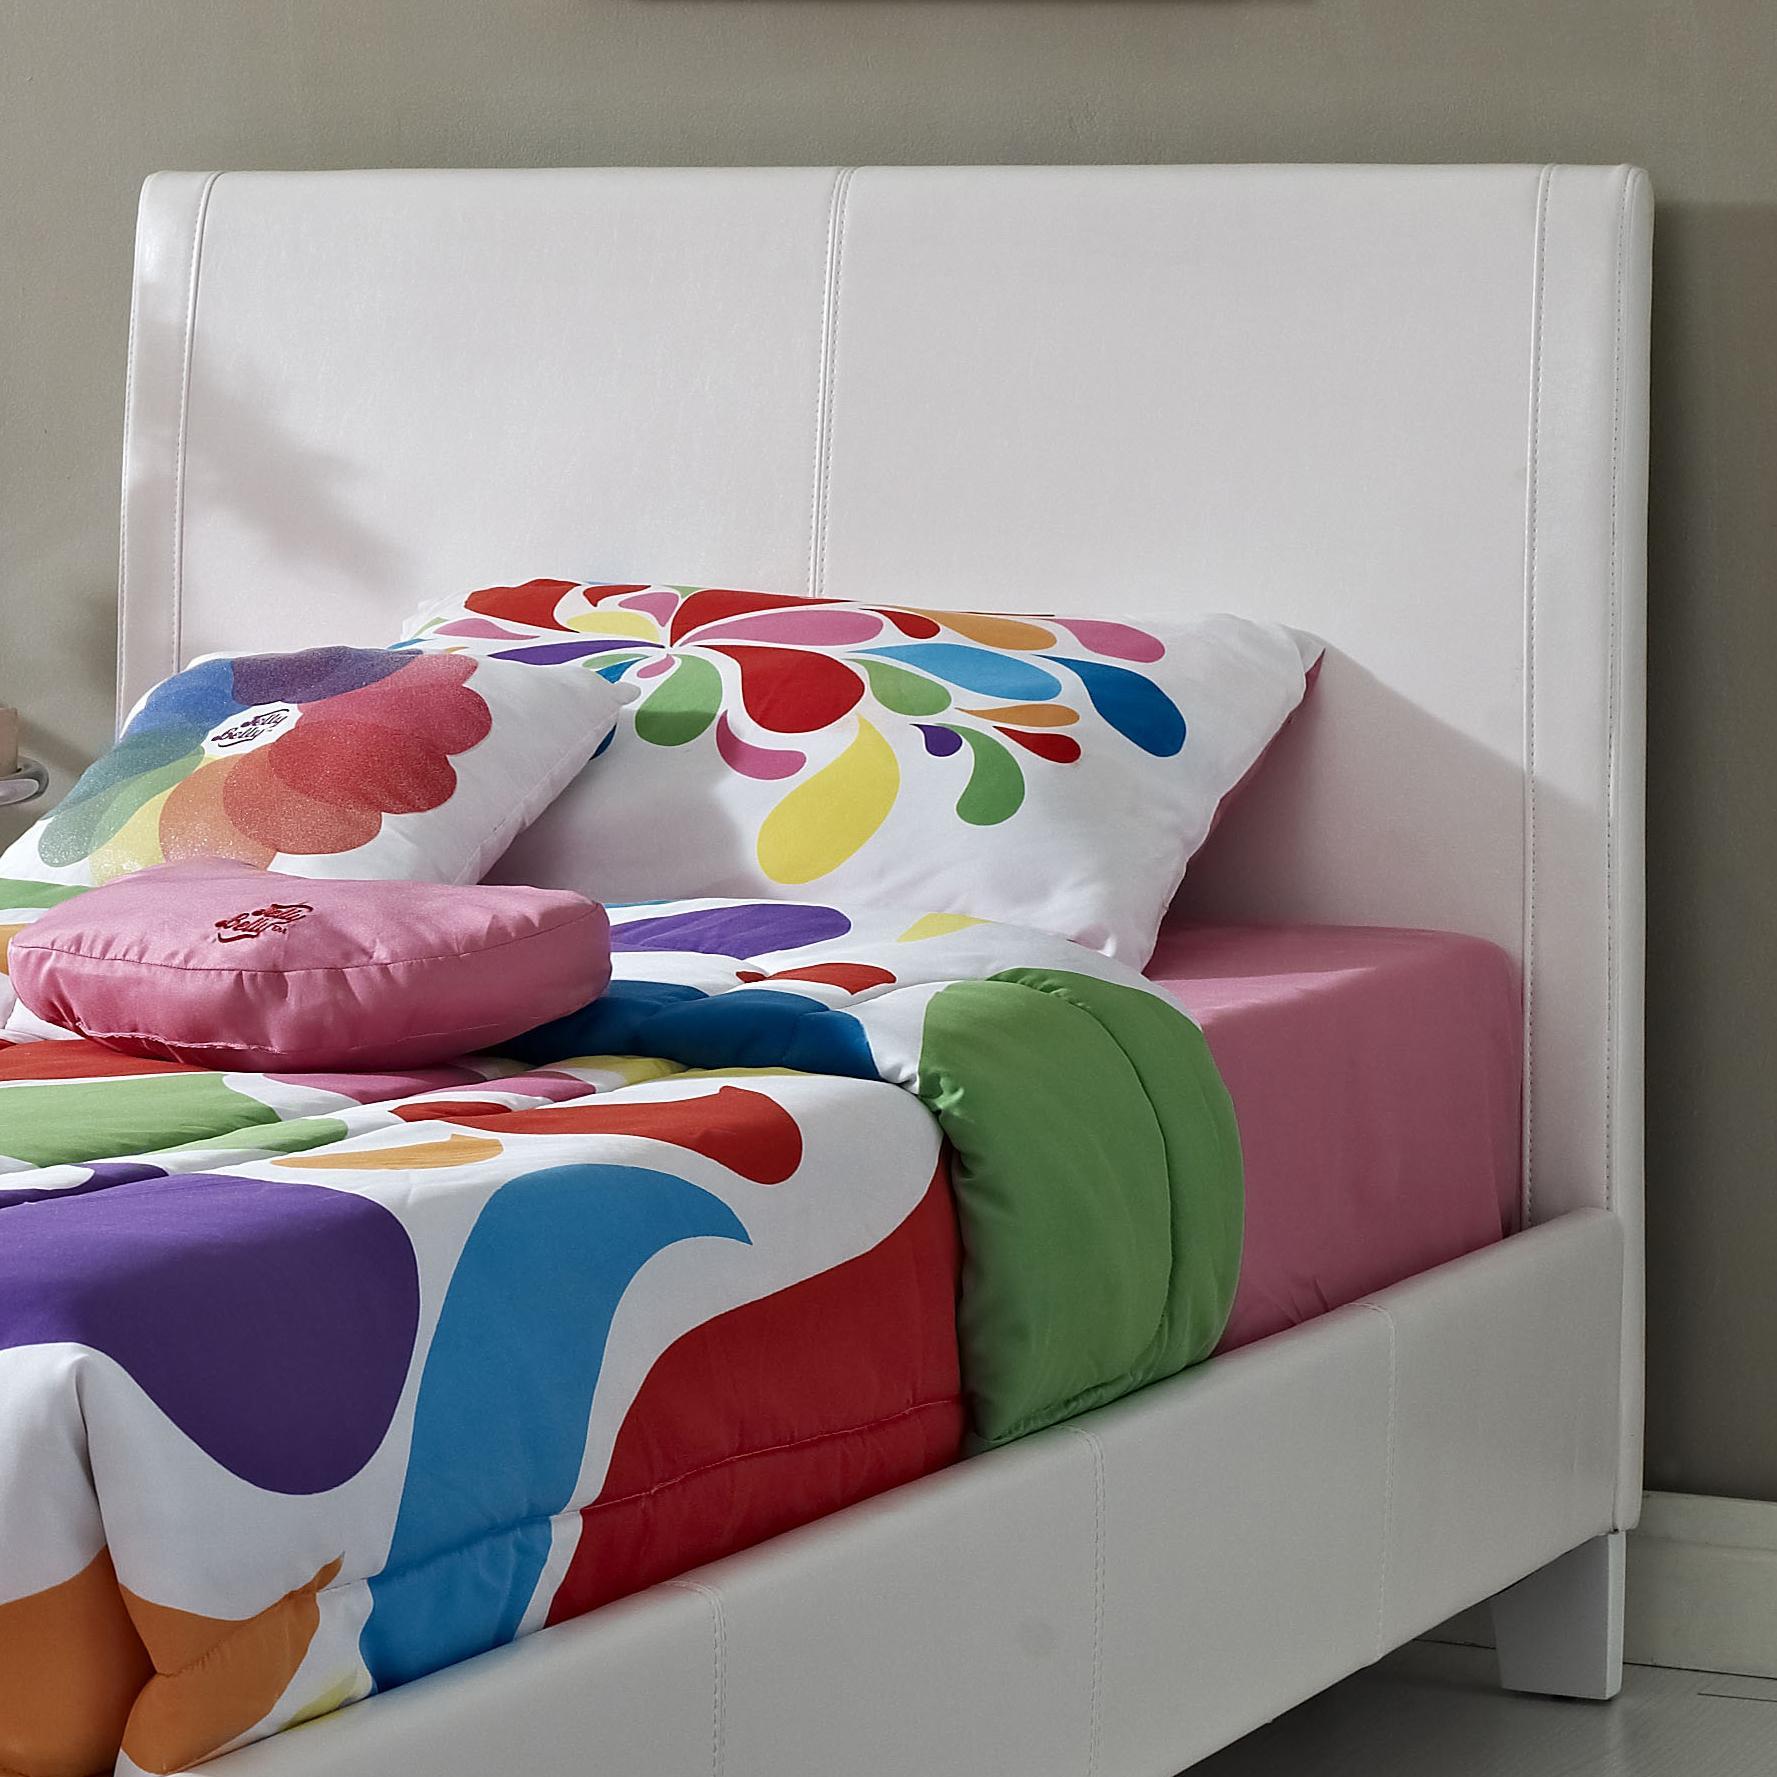 Standard Furniture Fantasia Twin Upholstered Headboard - Item Number: 60756